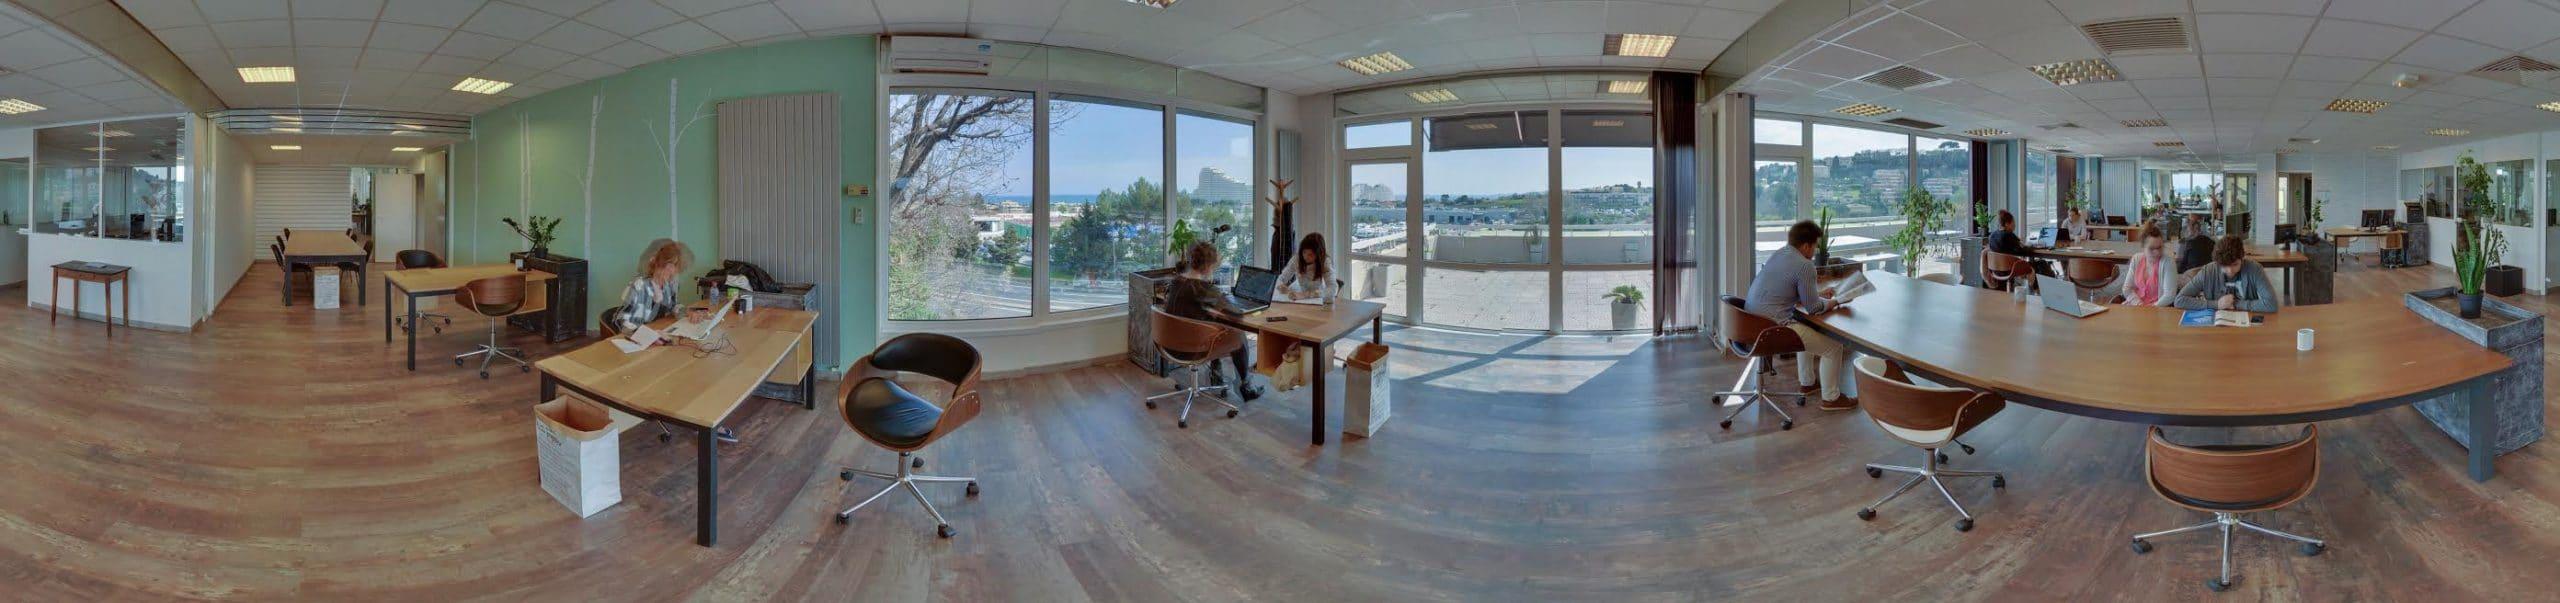 coworking-visitevirtuelle